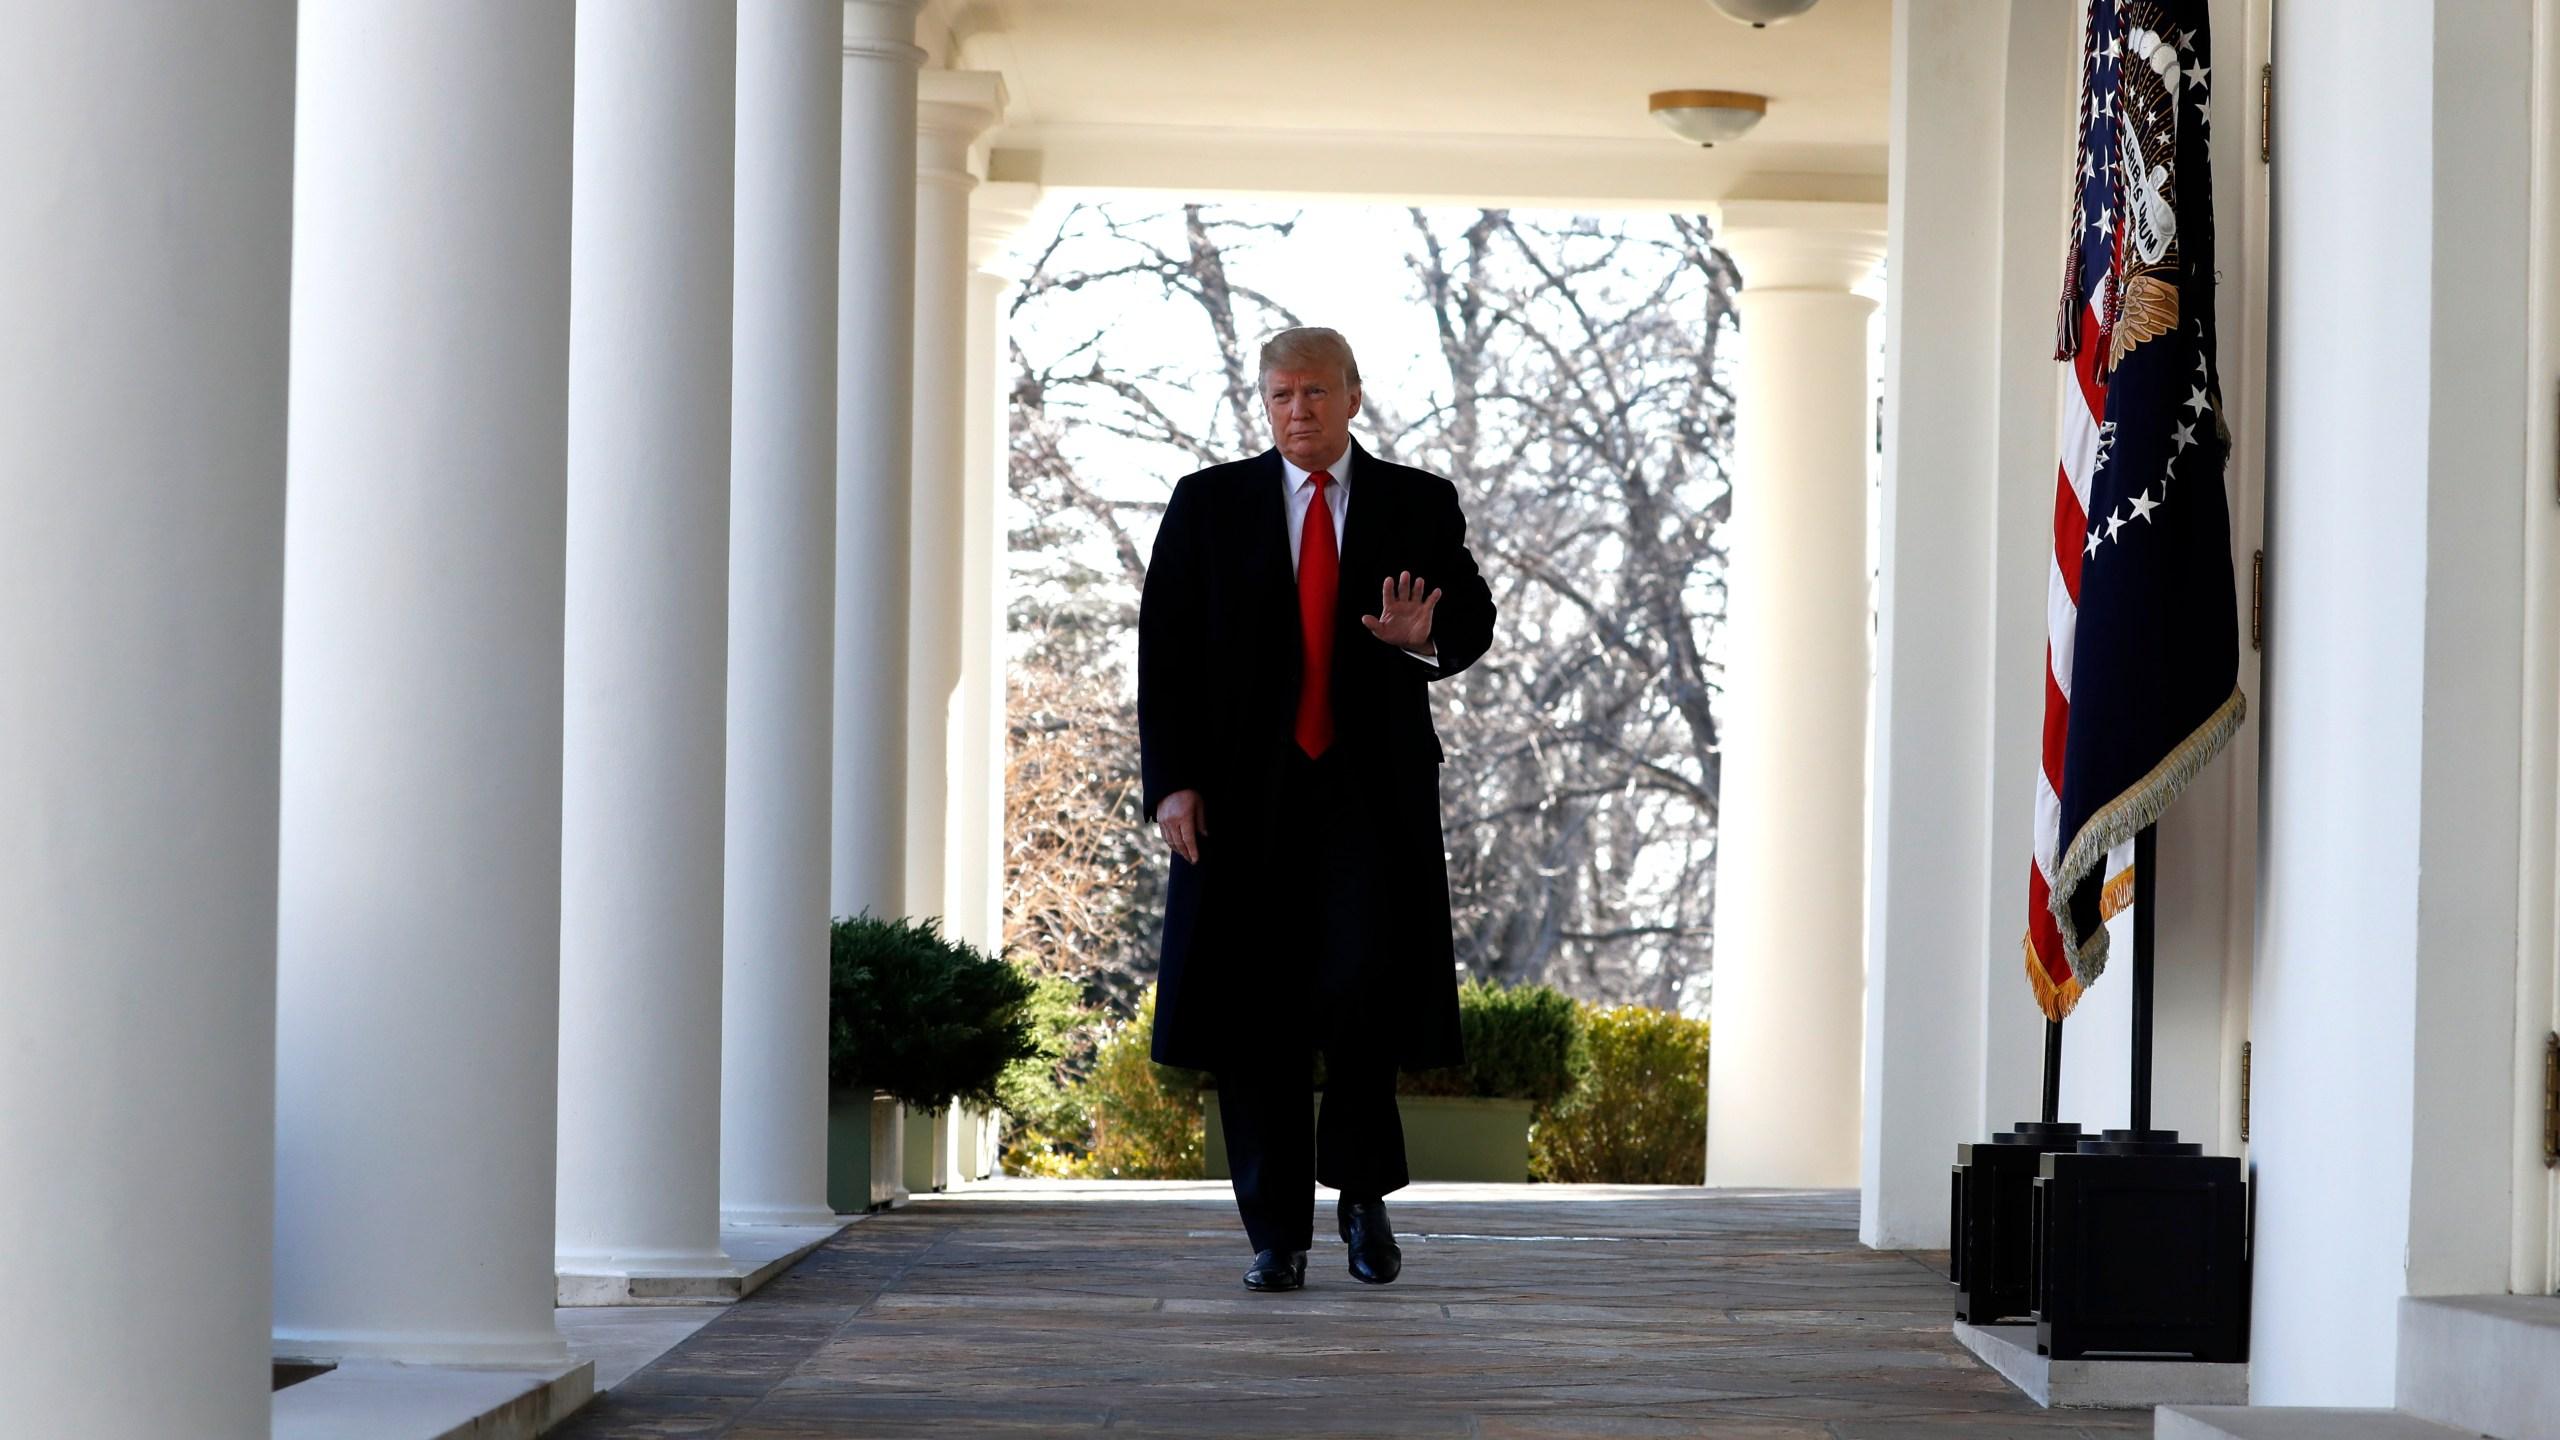 Trump_Government_Shutdown_14421-159532.jpg99057697